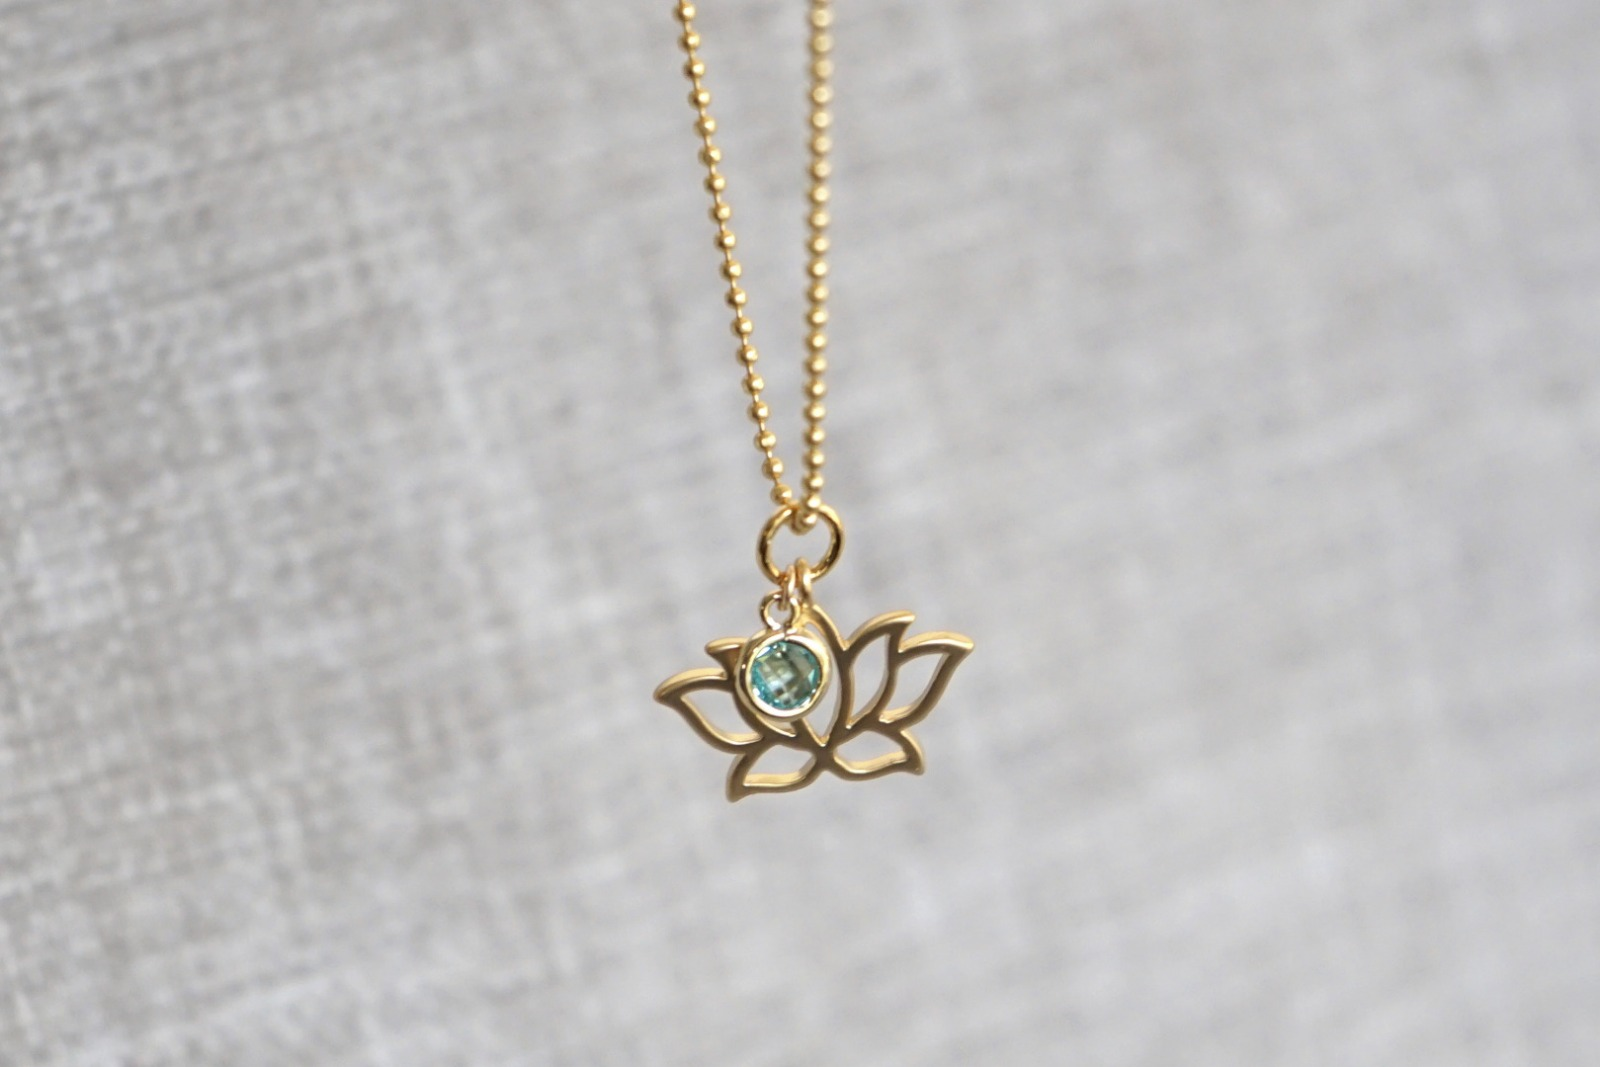 Kugelkette mit Lotusblüte und Kristall - türkis - 2